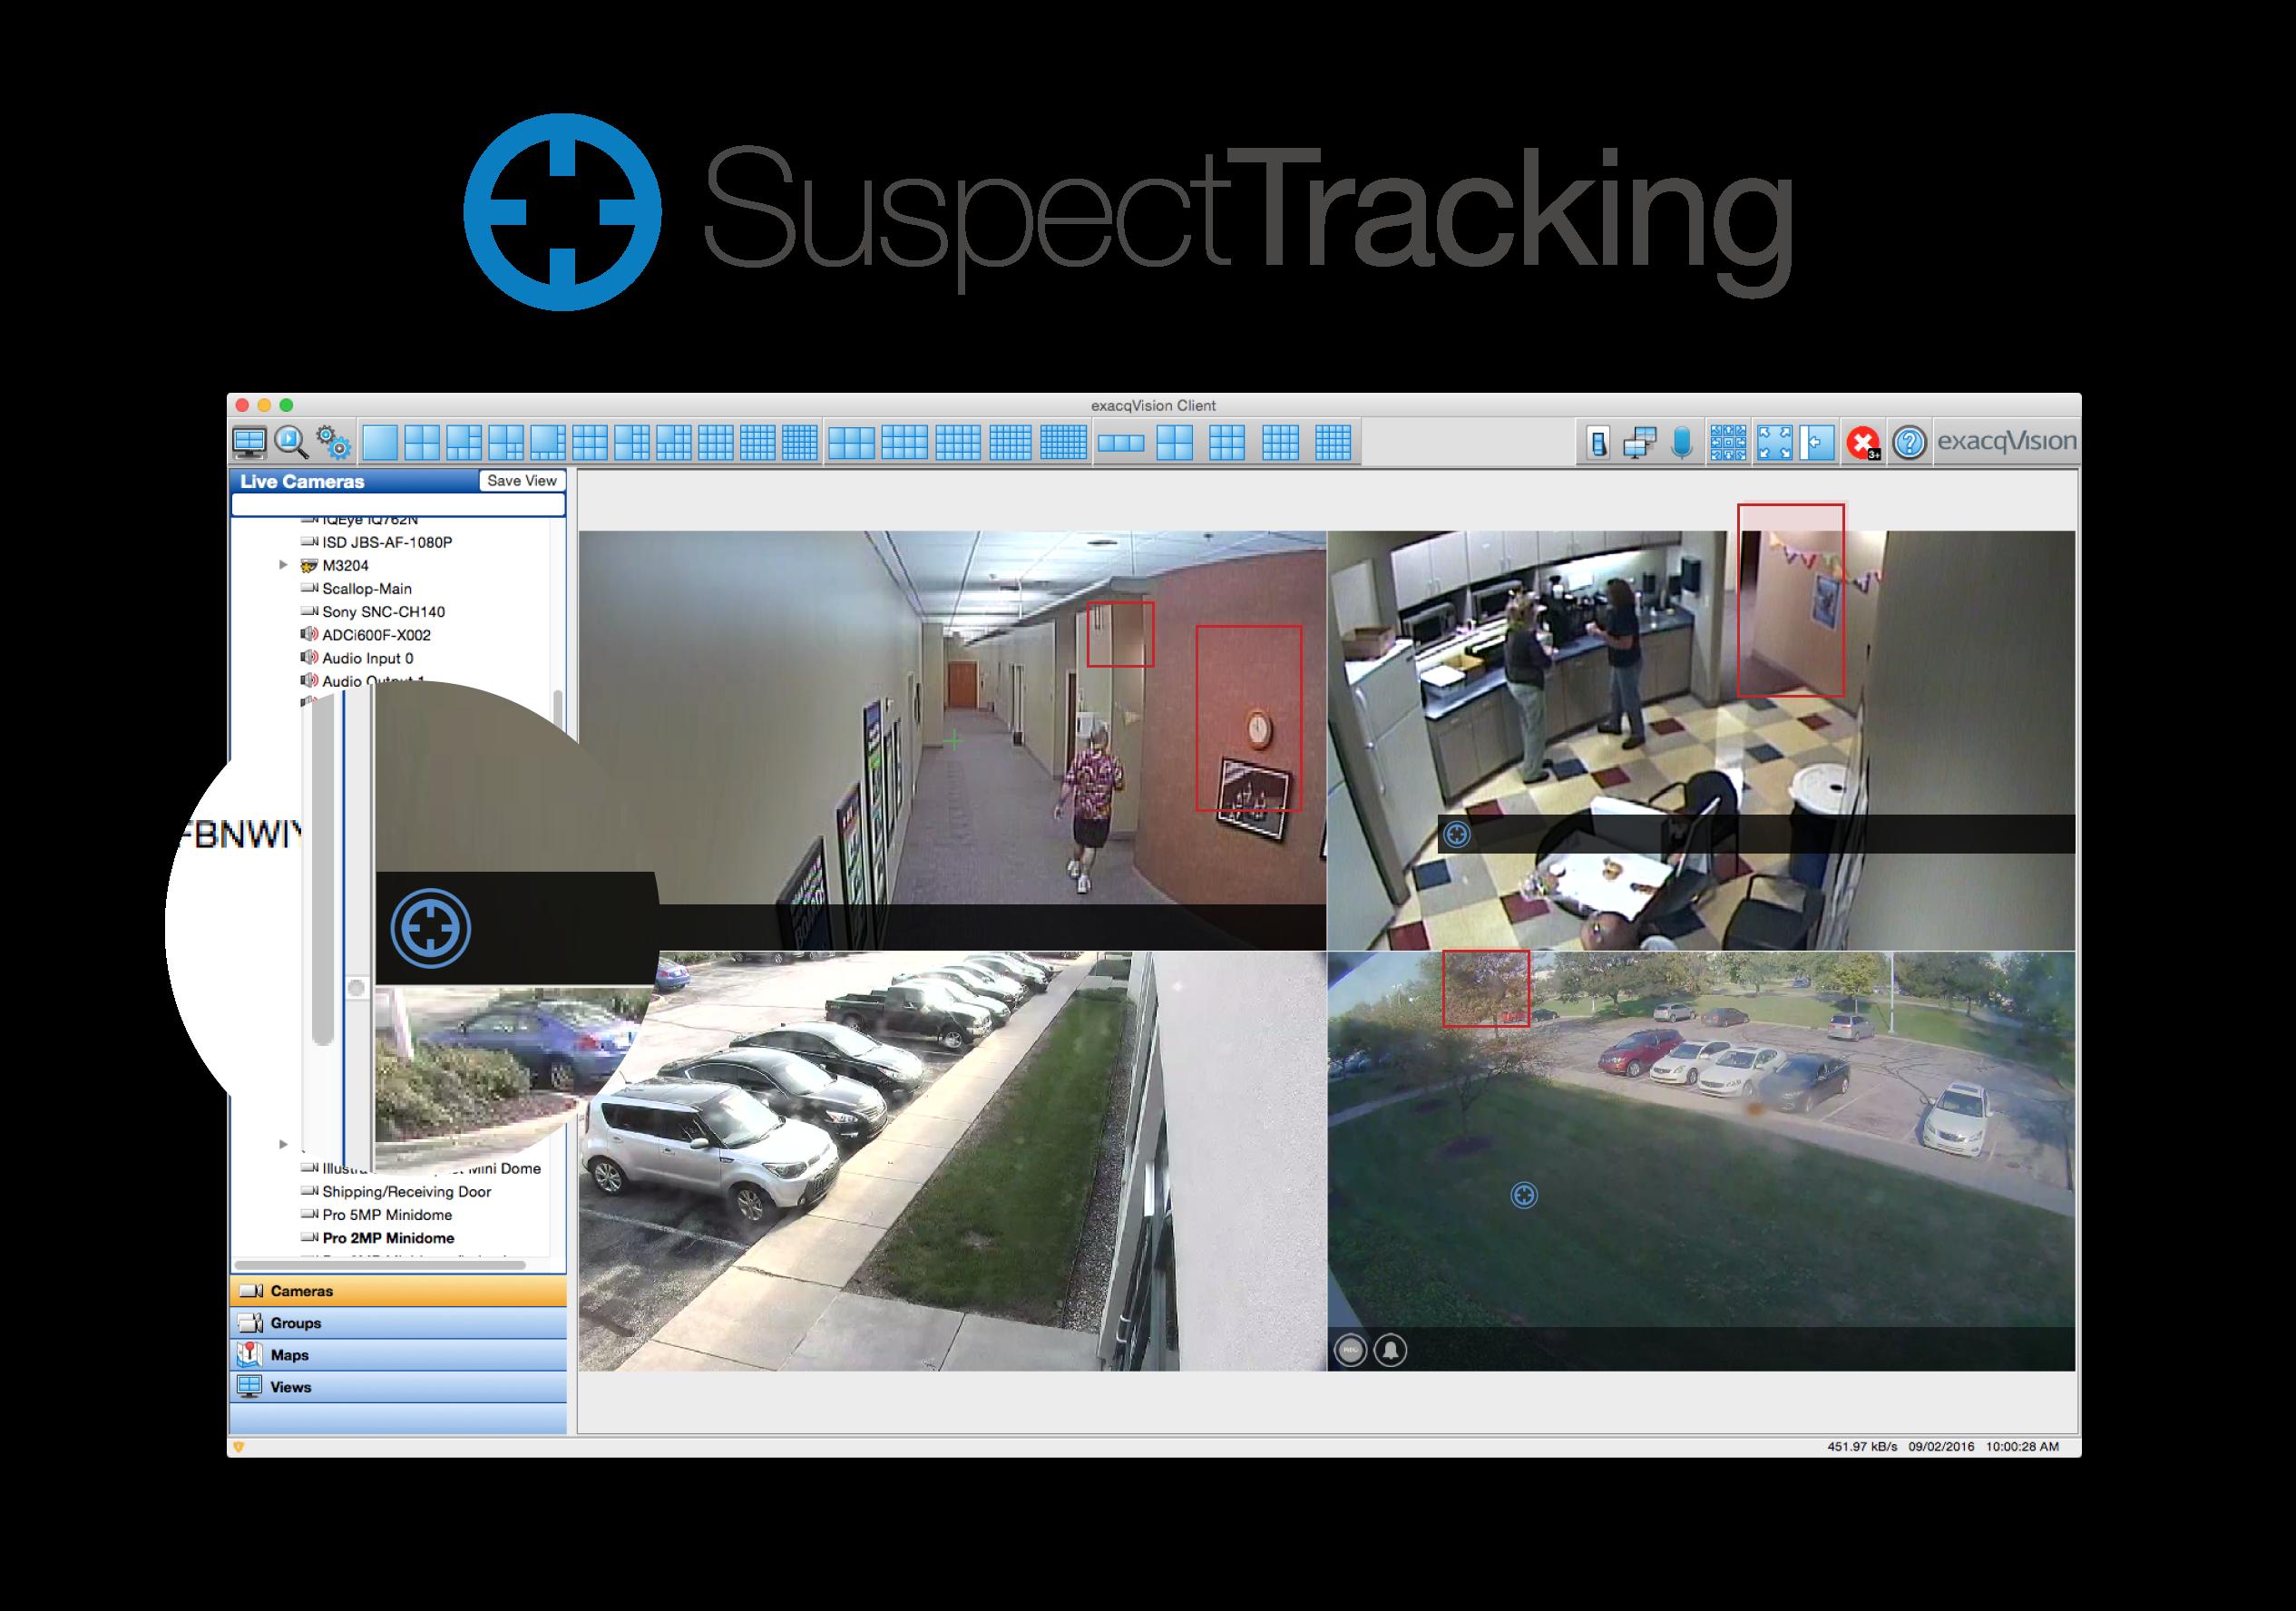 Exacq Suspect Tracking